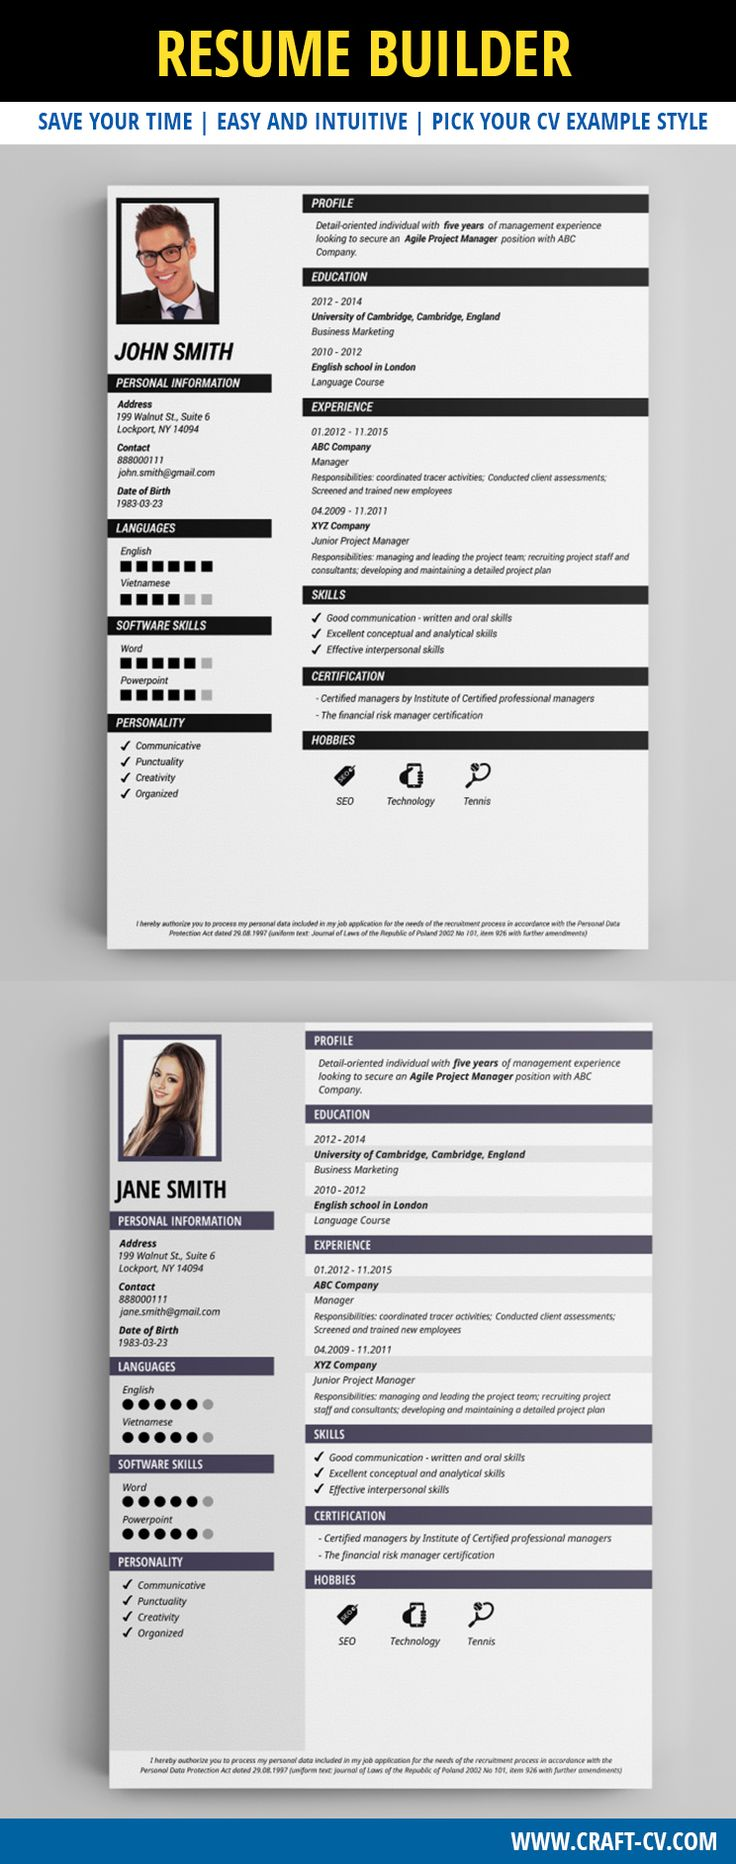 Resume Example   Professional Resume Template #resume #resumeexamples # Freeresume